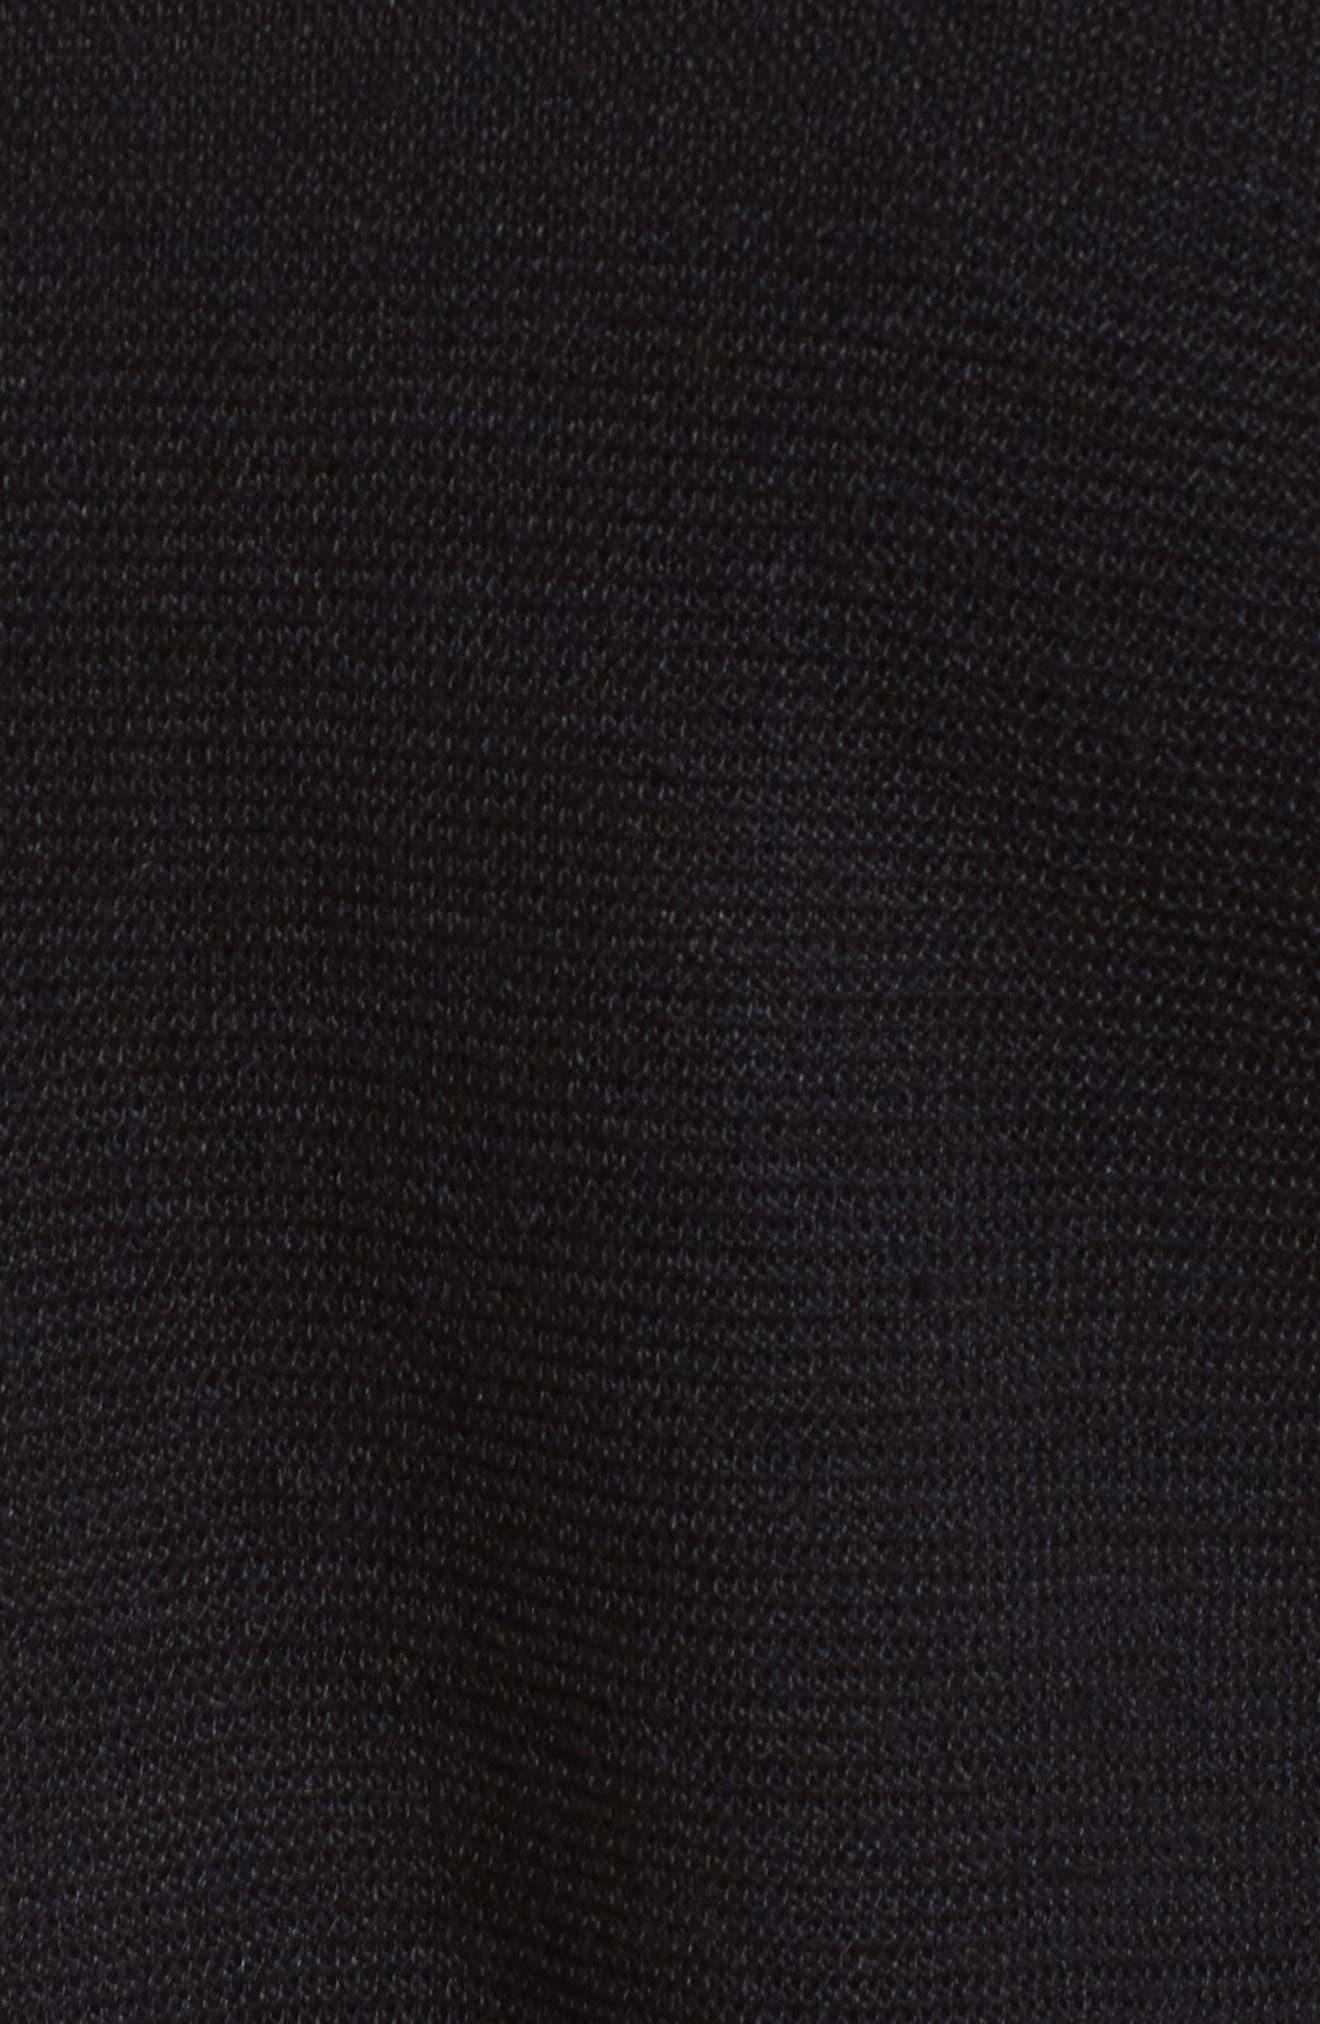 V-Neck Organic Linen Top,                             Alternate thumbnail 25, color,